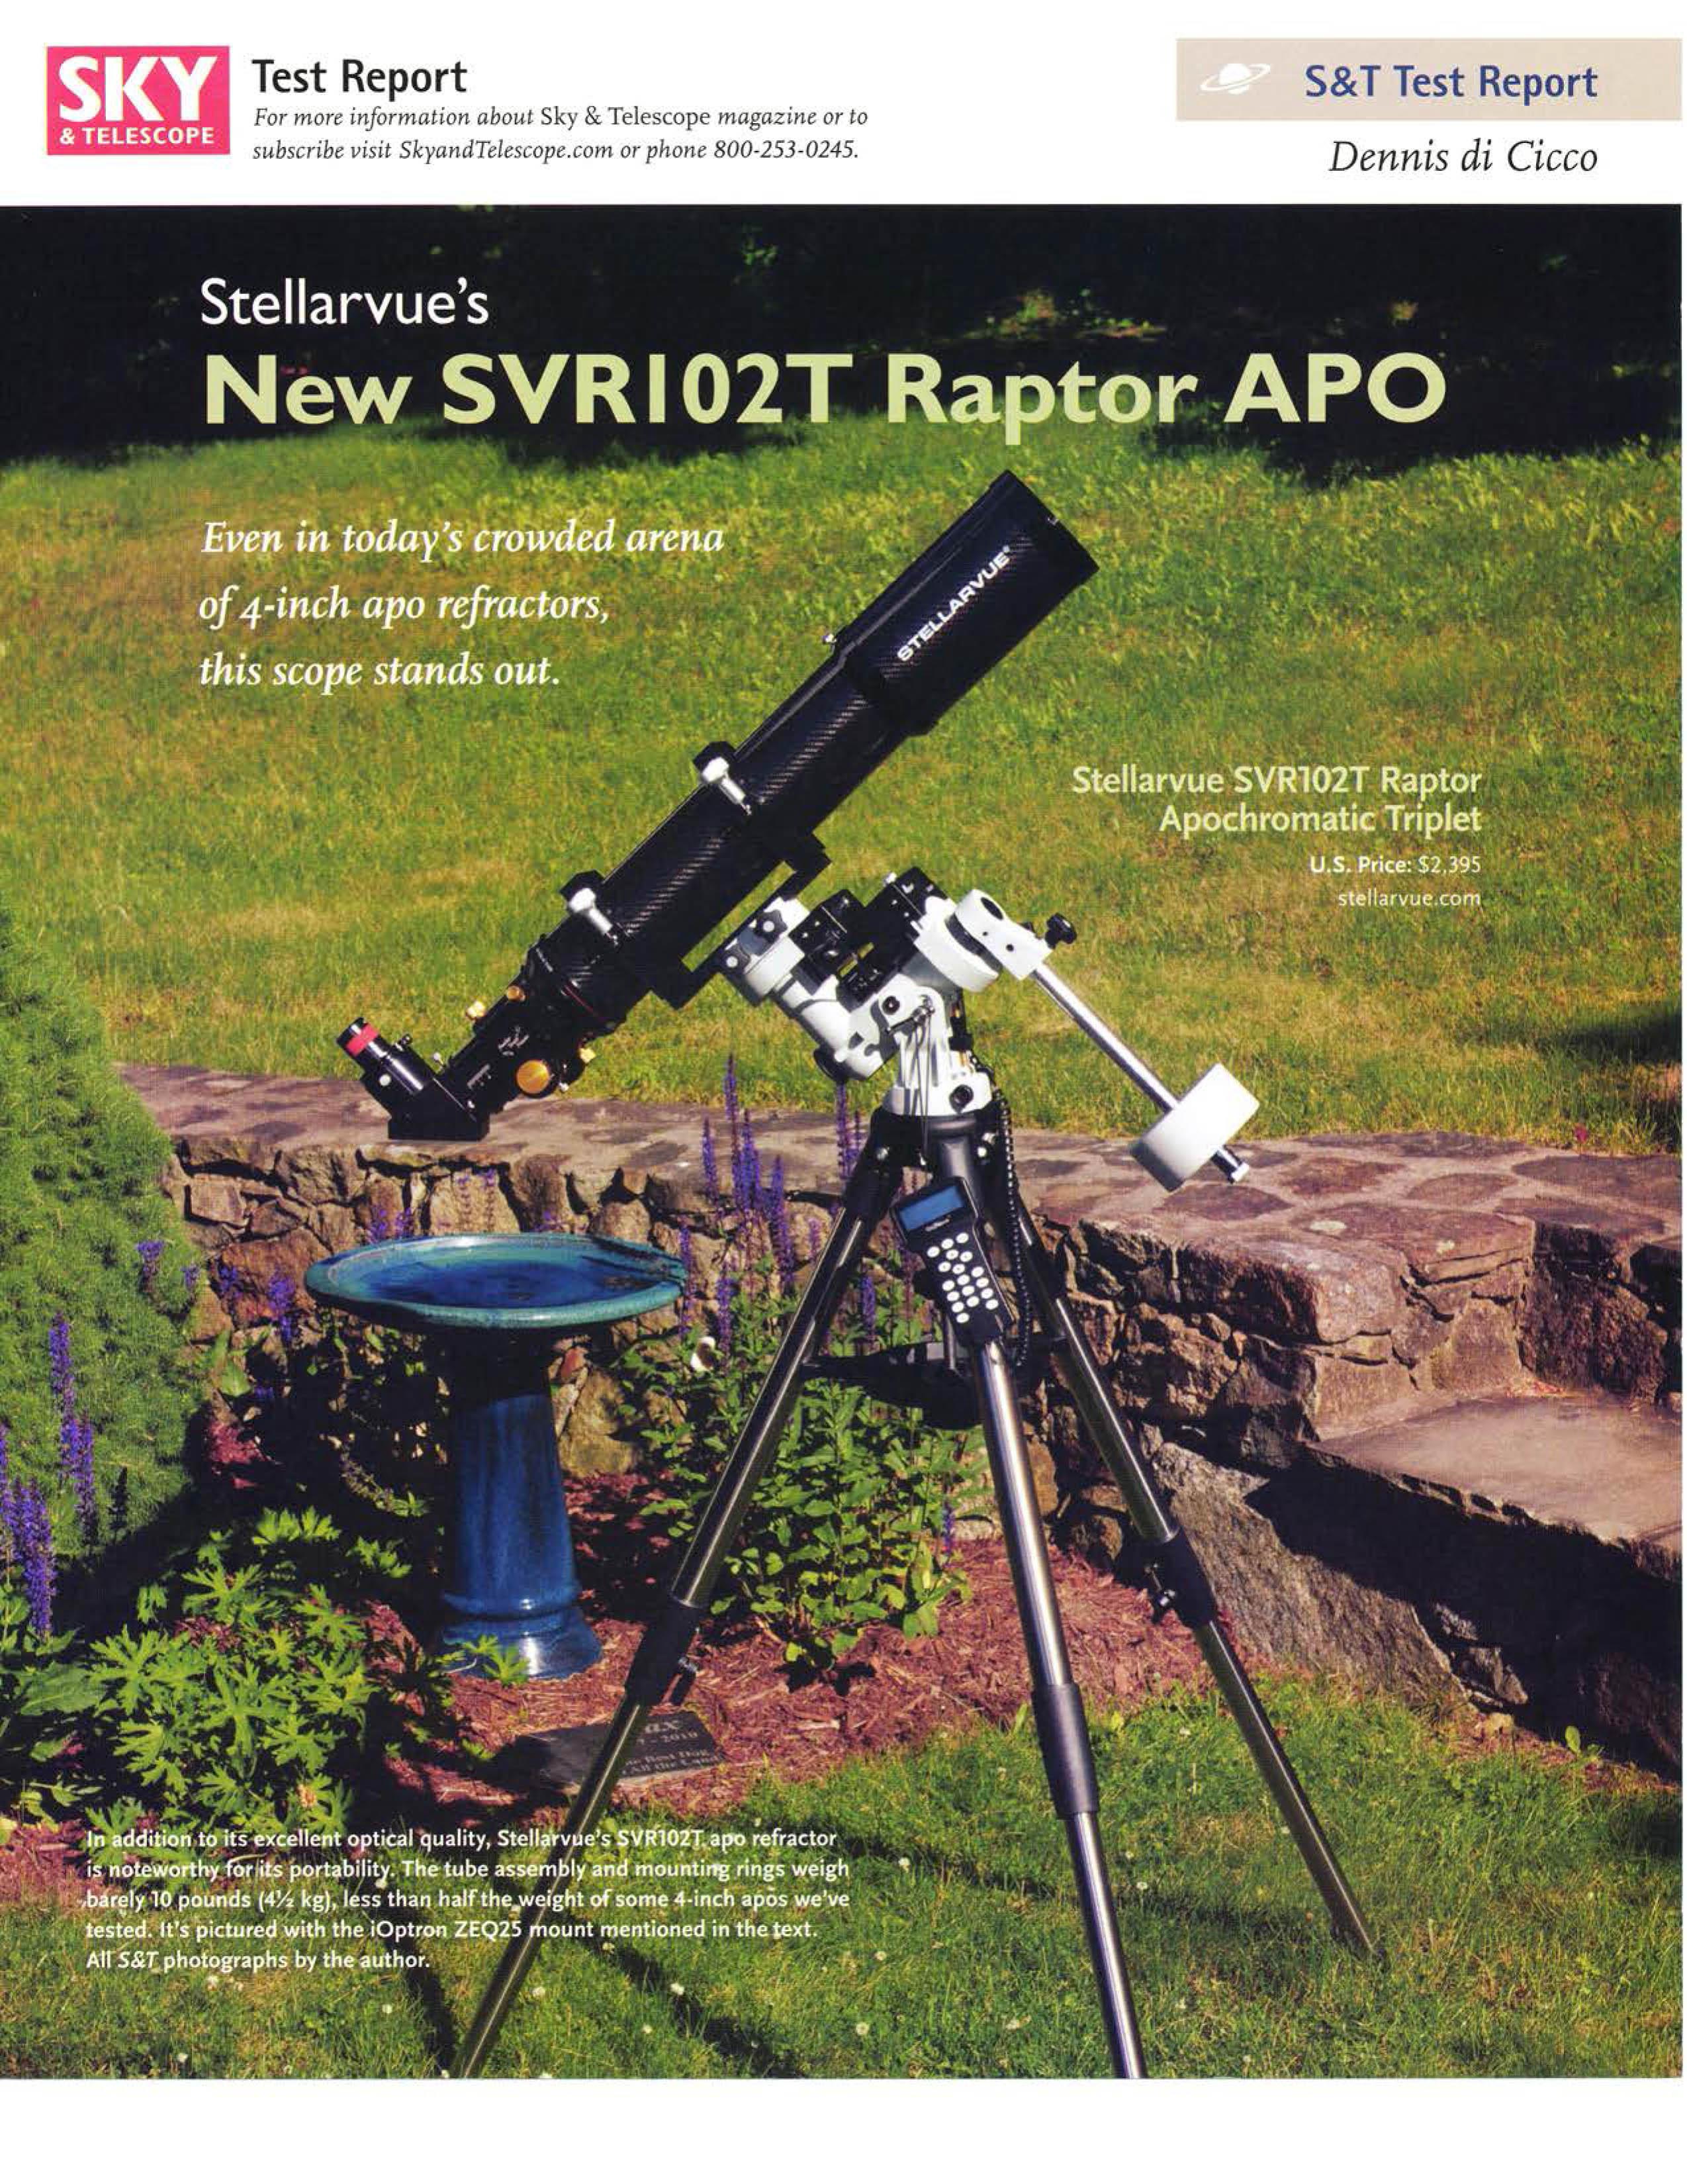 svr102t-review-reduced-1.jpg